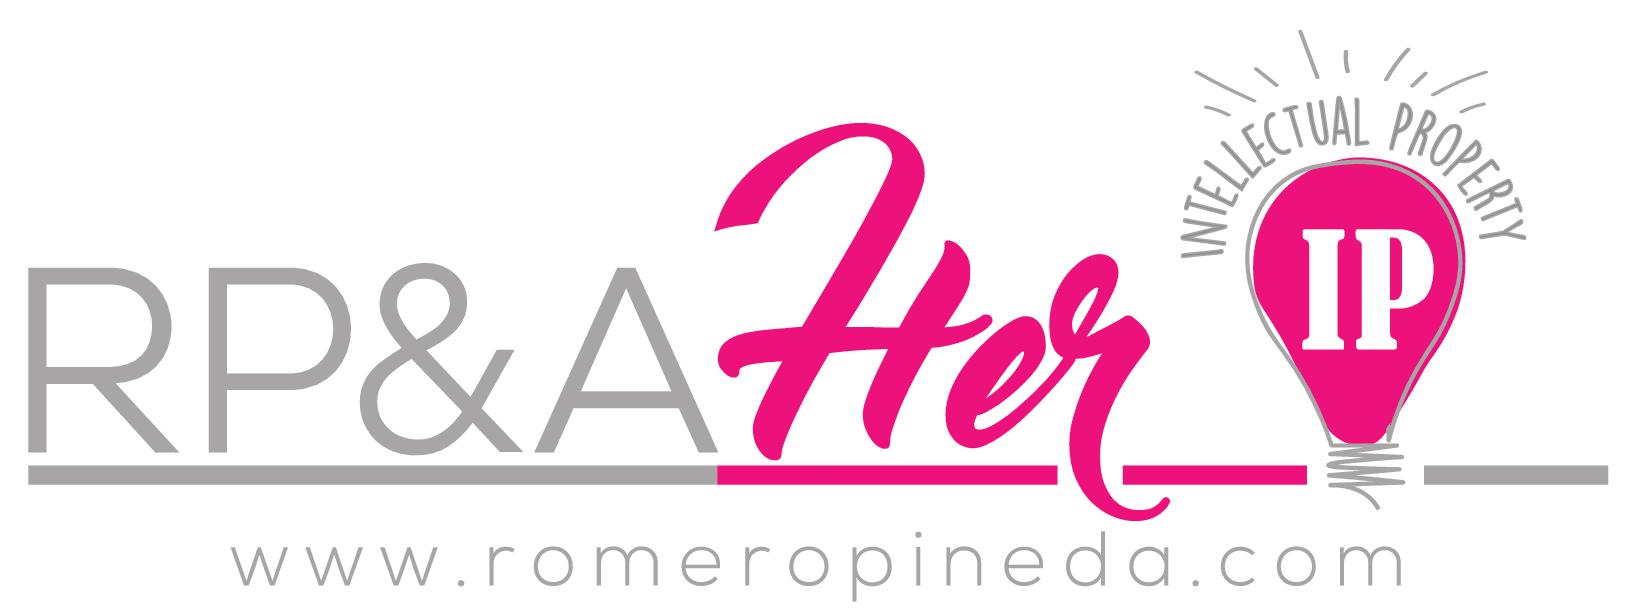 RP&A HER – Apoyo a la mujer emprendedora